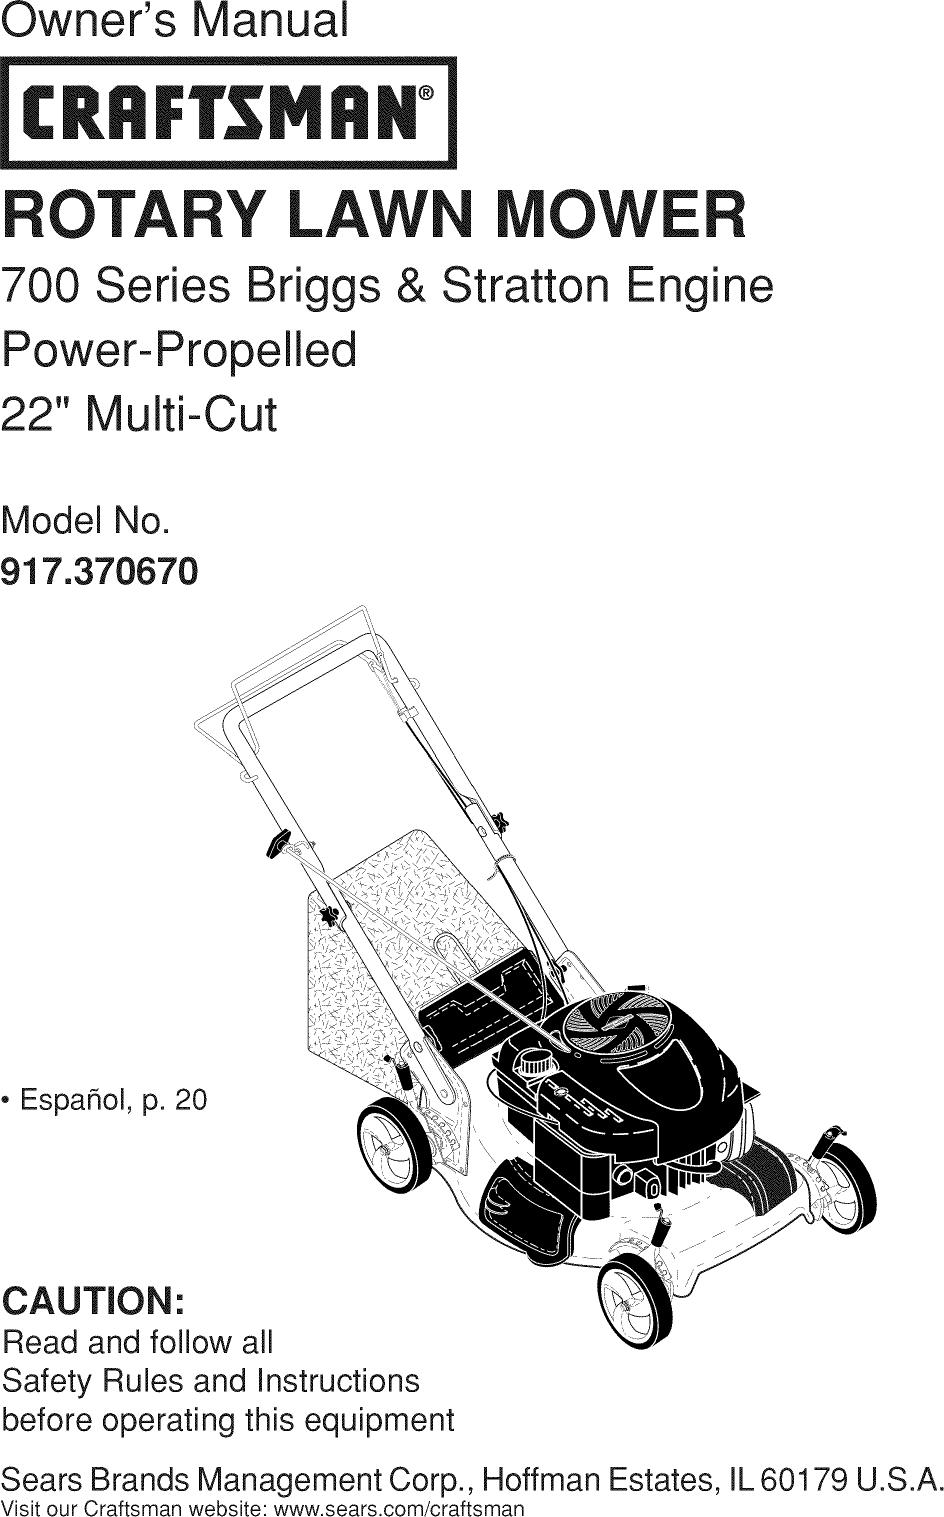 Craftsman 917370670 User Manual MOWER Manuals And Guides